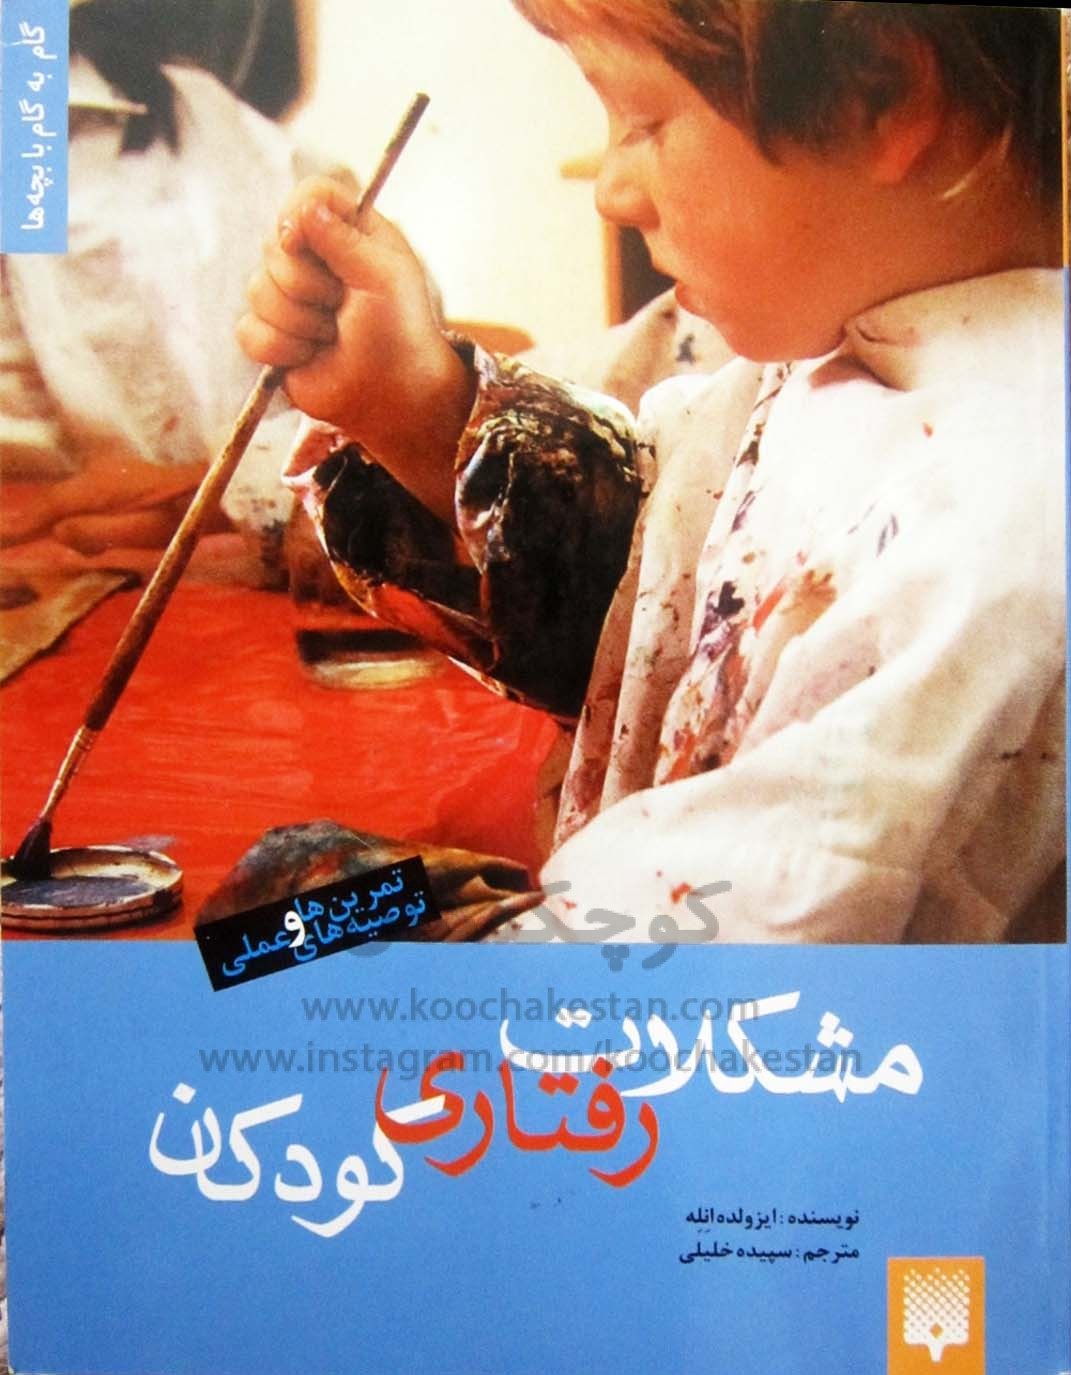 مشکلات رفتاری کودکان - کتابخانه کودک - کوچکستان